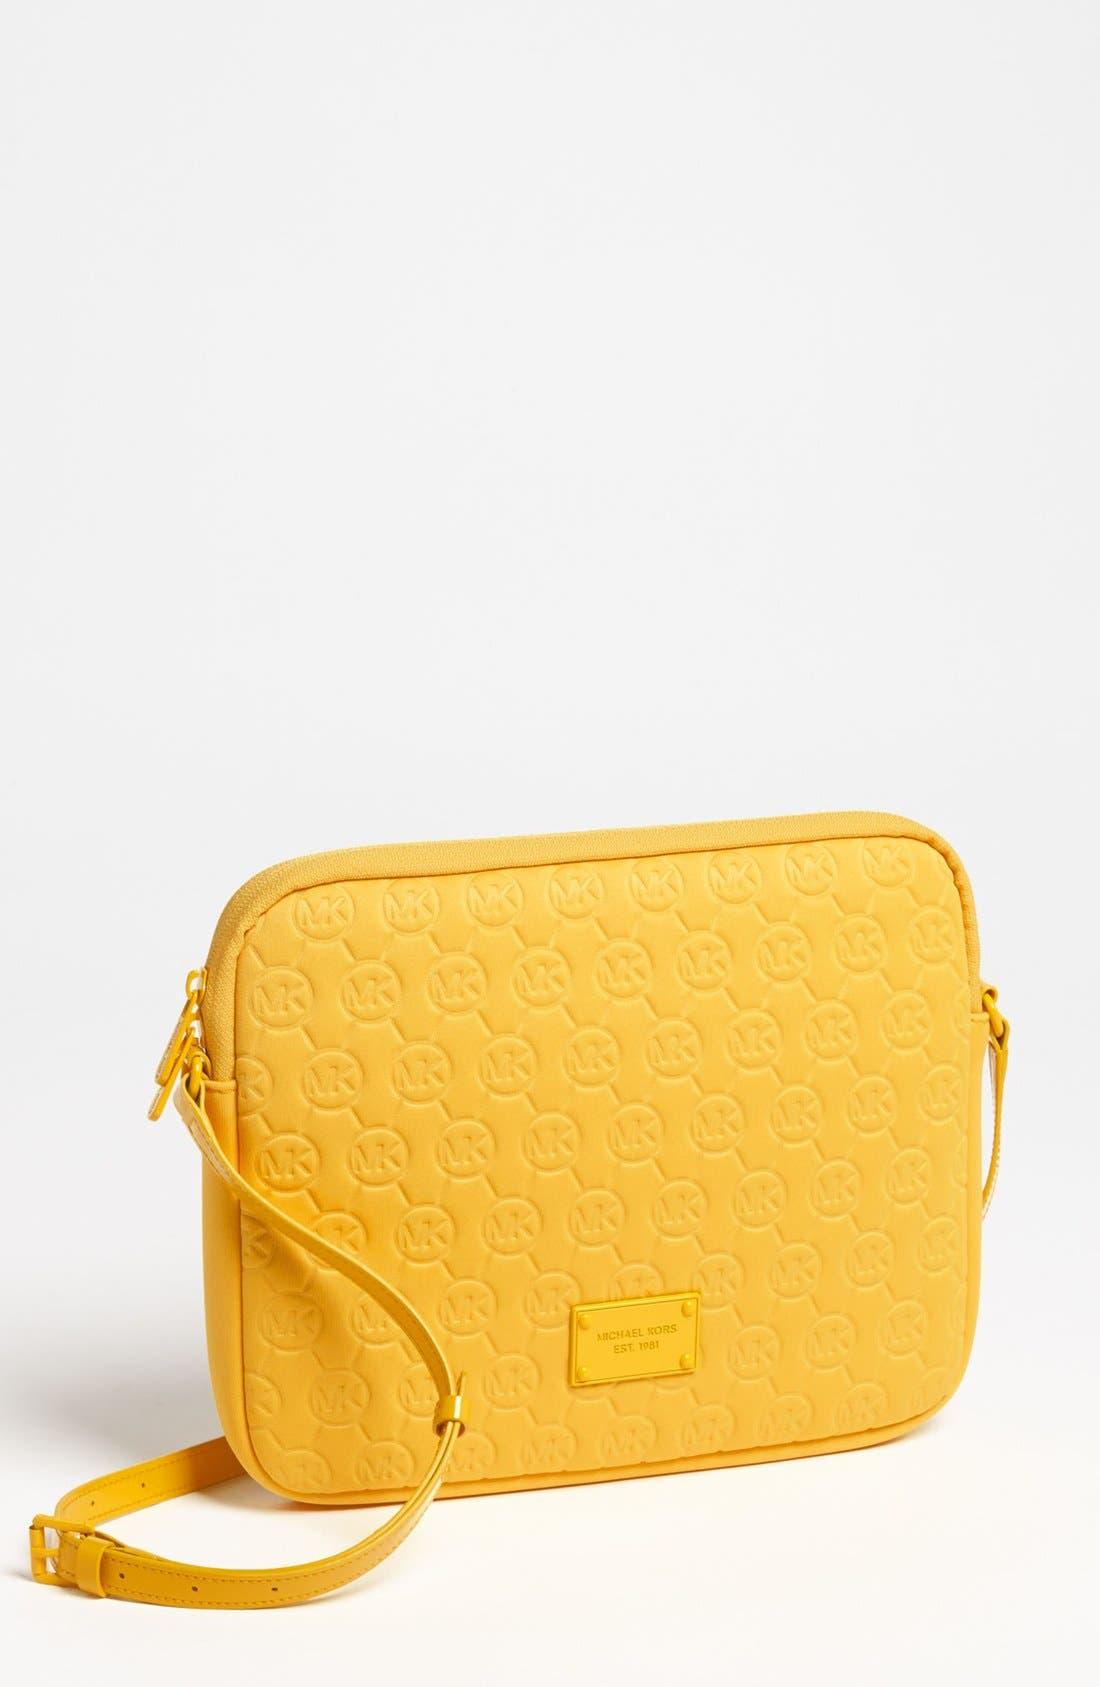 Alternate Image 1 Selected - MICHAEL Michael Kors iPad 2 Crossbody Bag